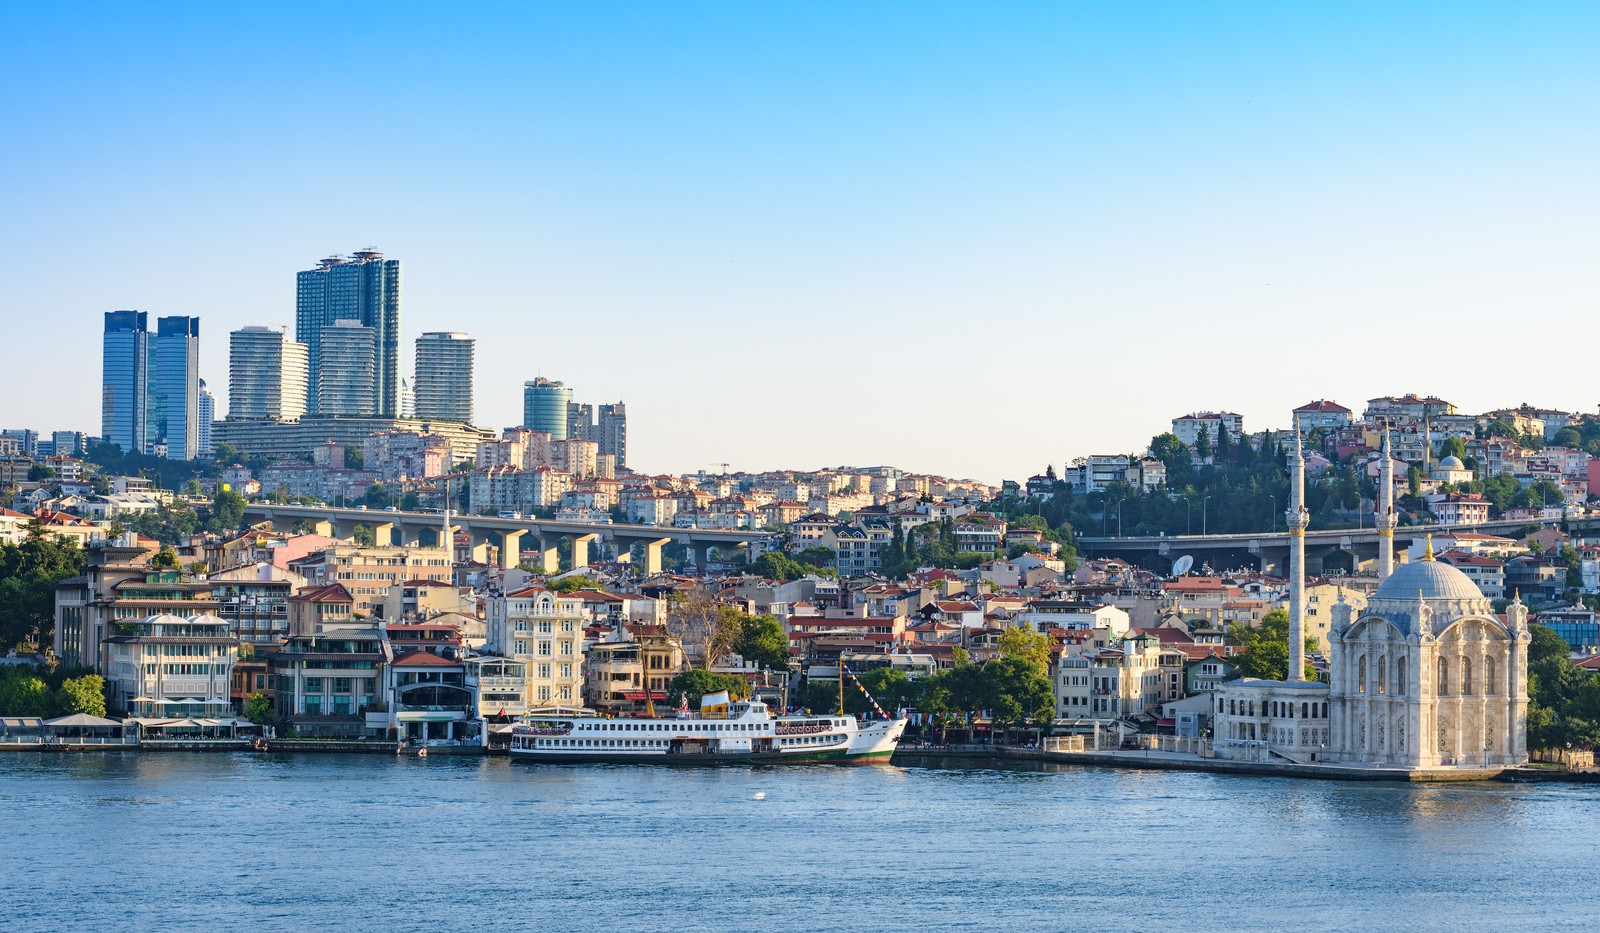 Canva - Istanbul from Bosporus.jpg